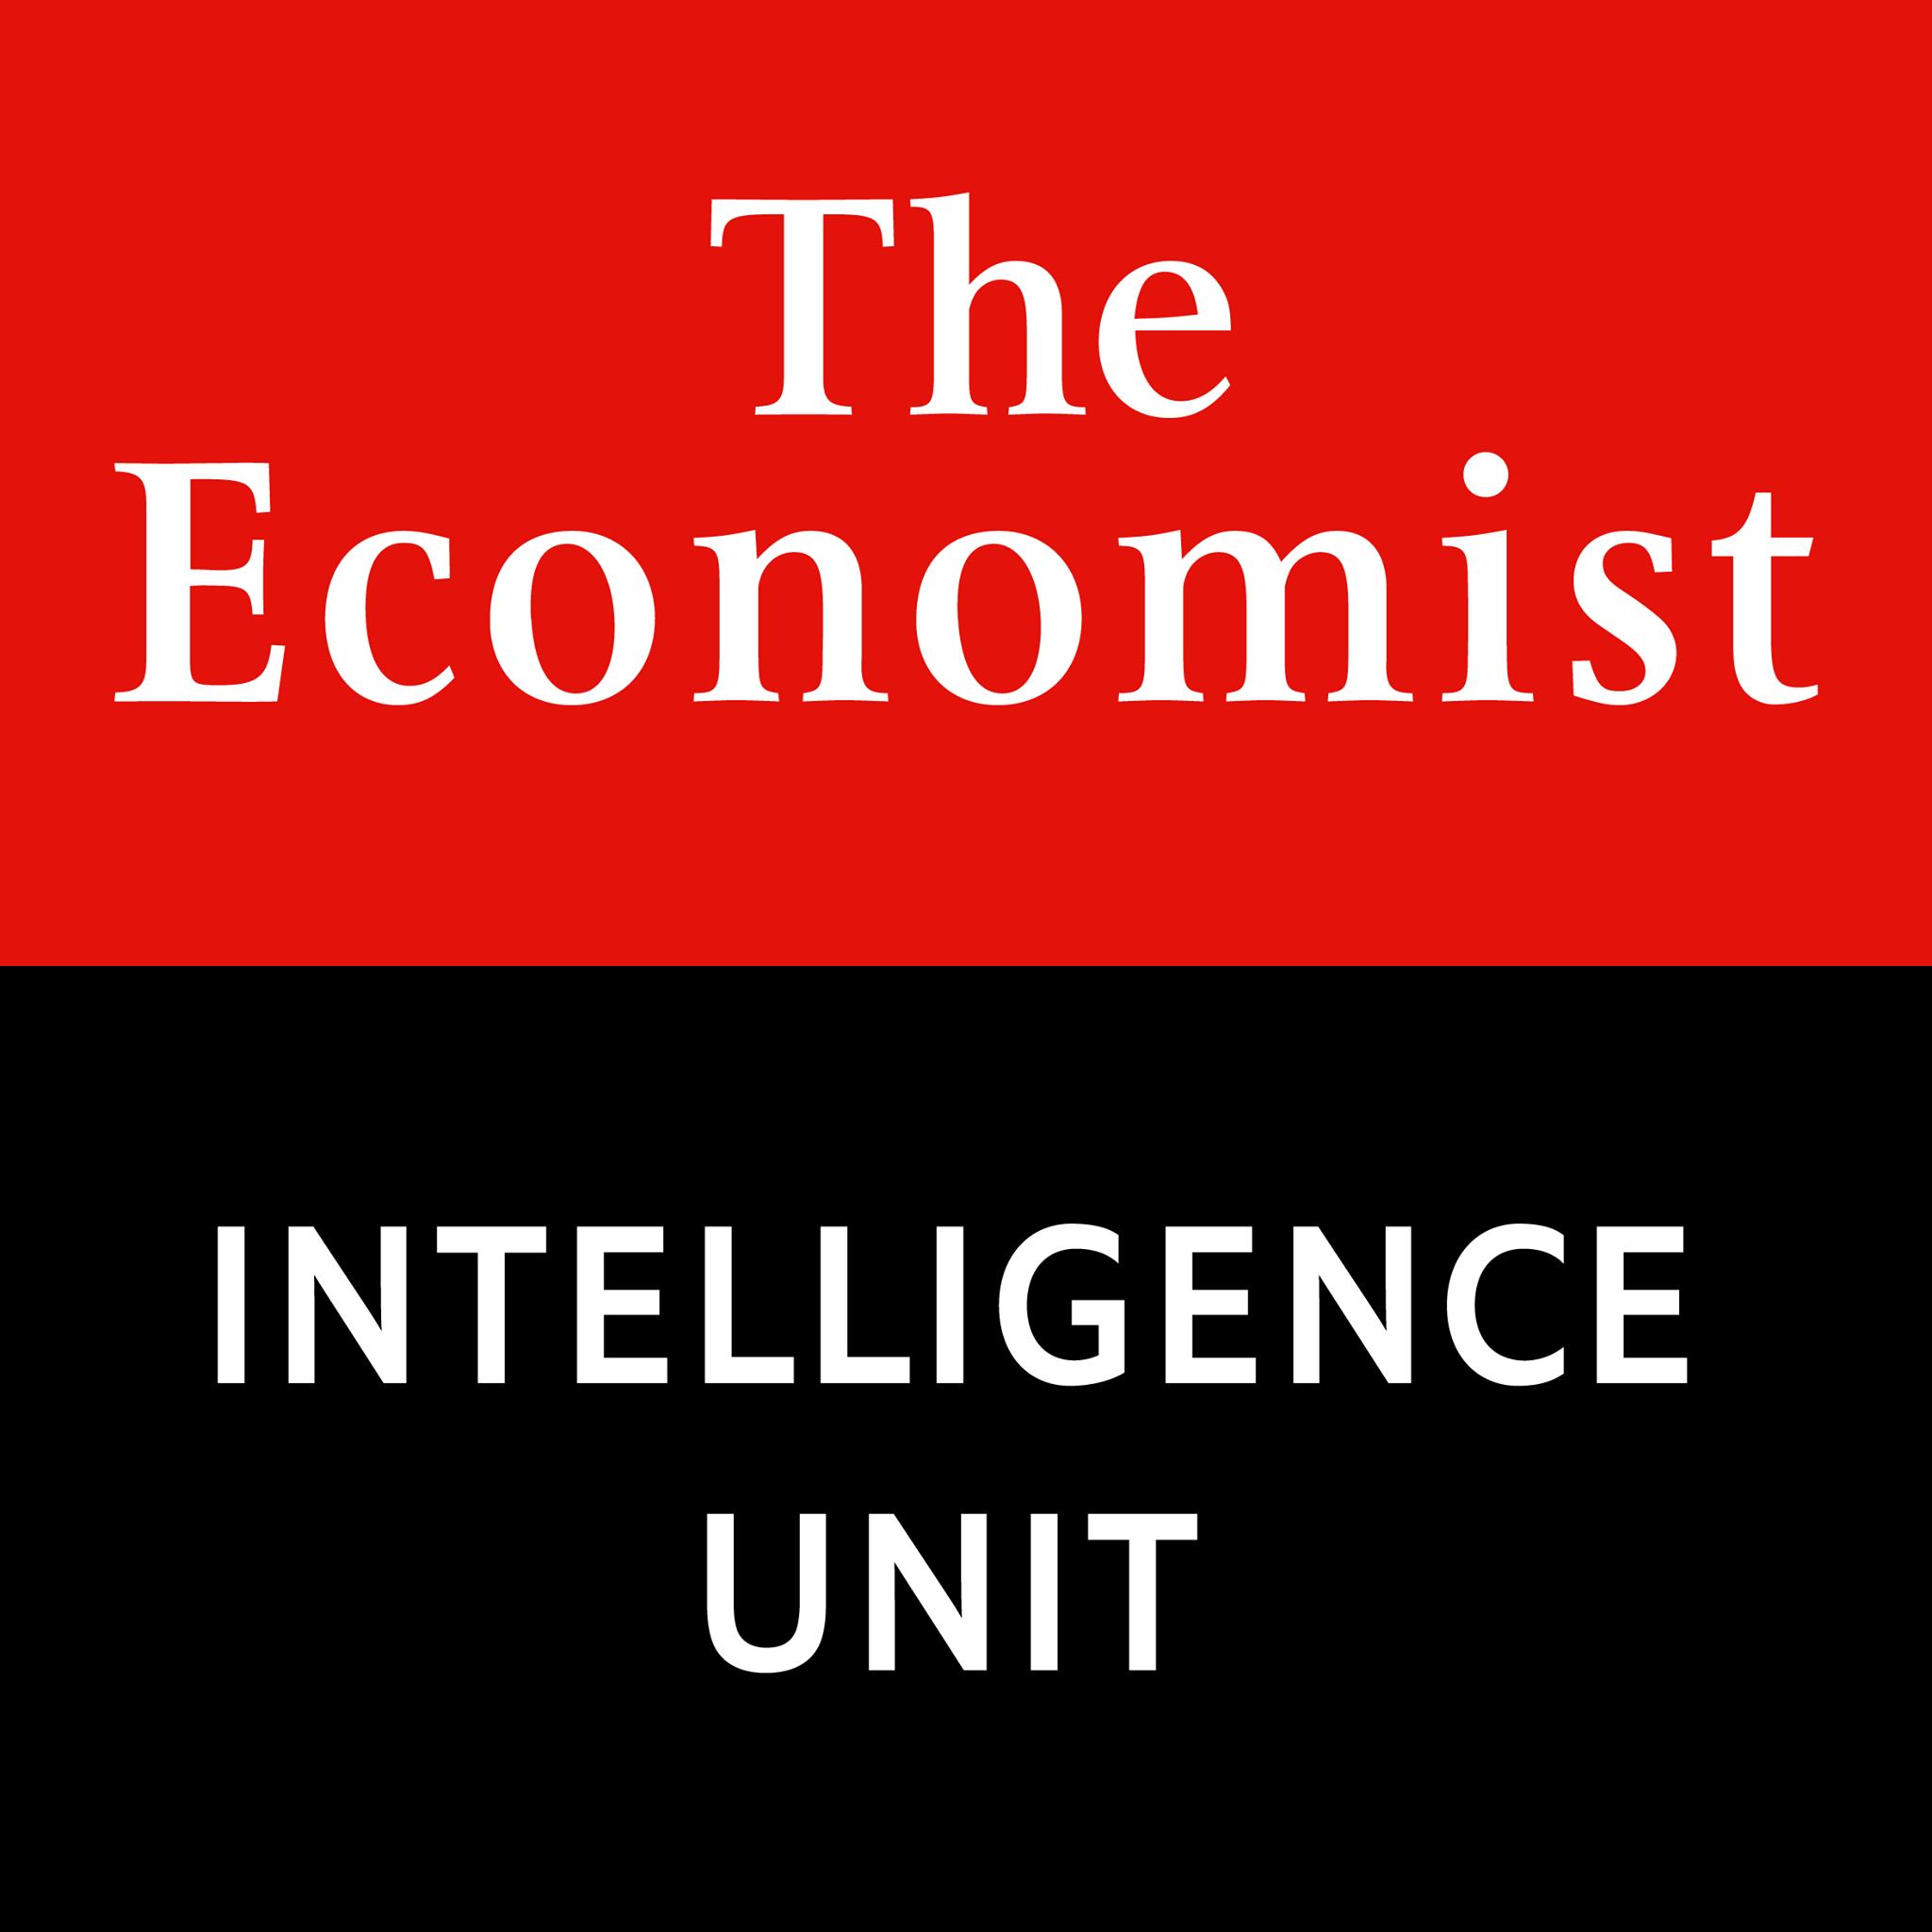 Image result for economist intelligence unit logo